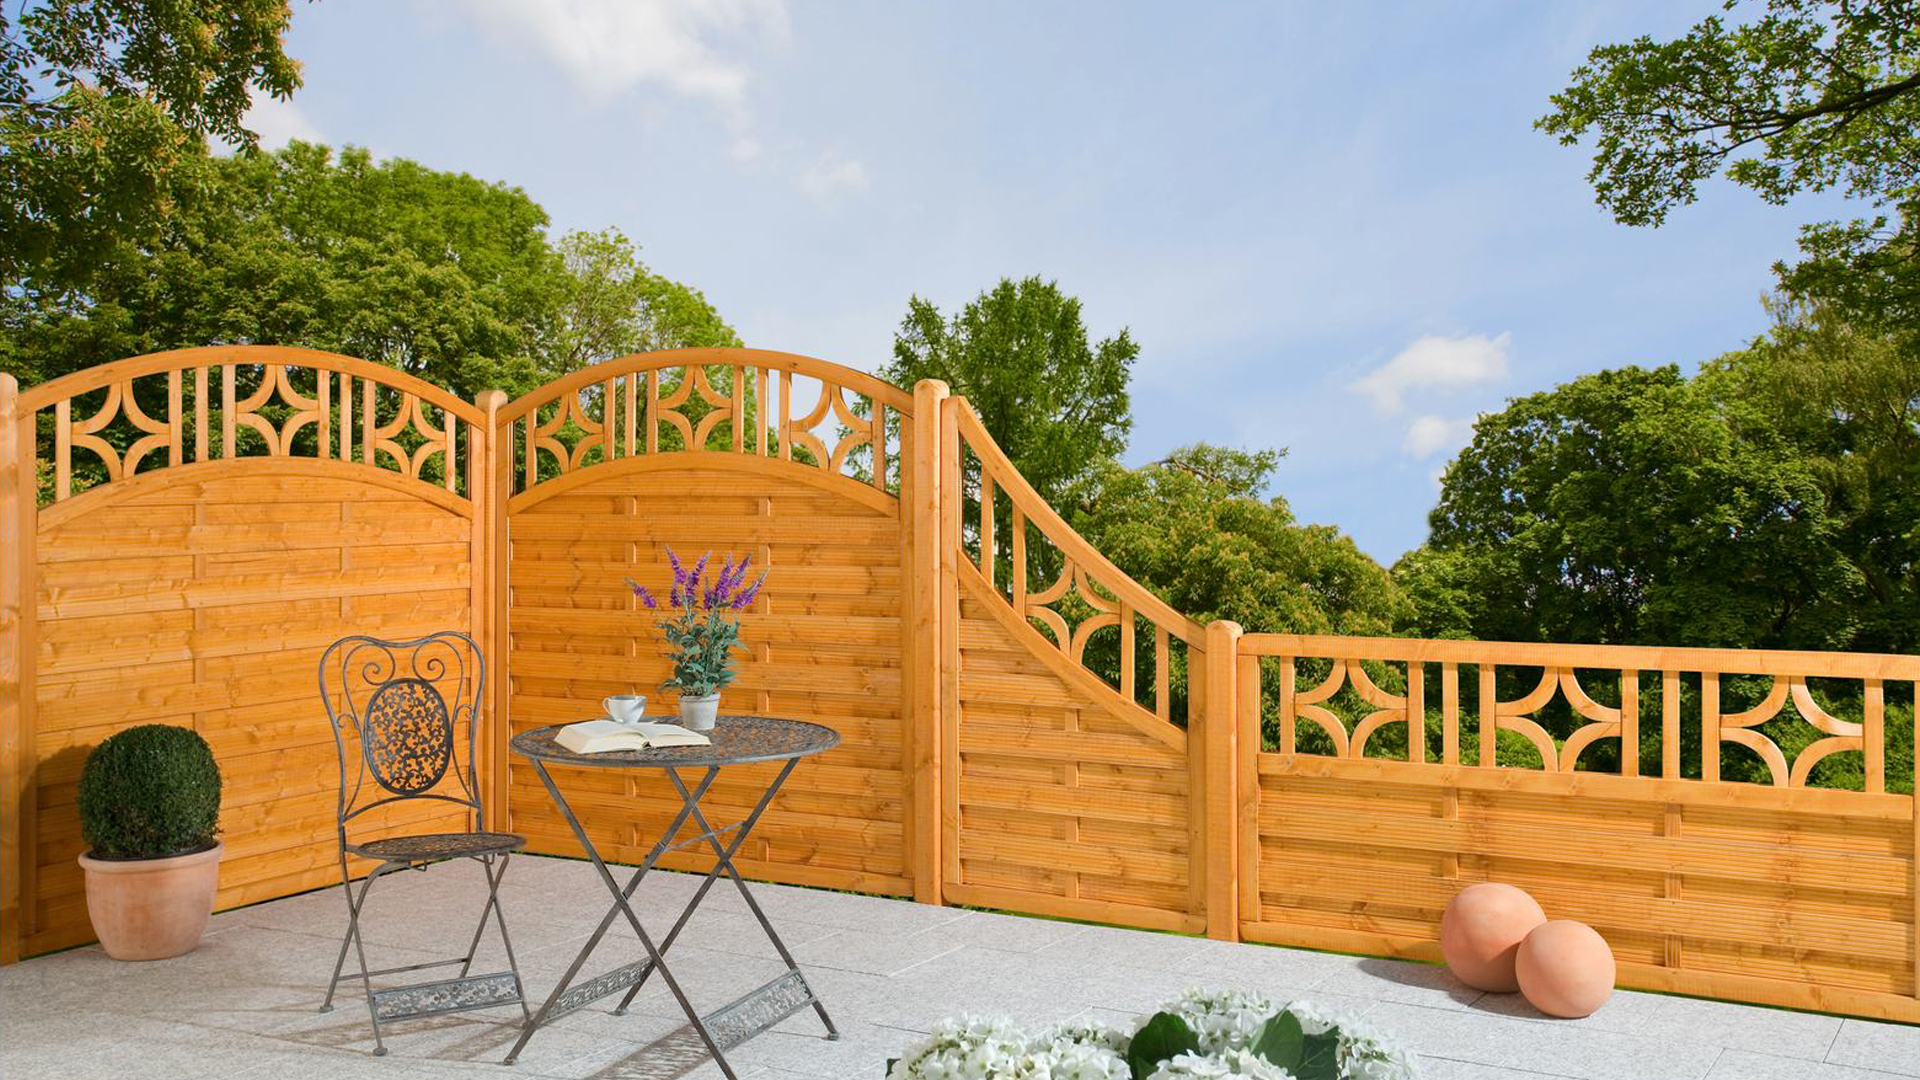 Tolle Gartenbank Holz Mit Rosenbogen Konzept Garten Design Ideen